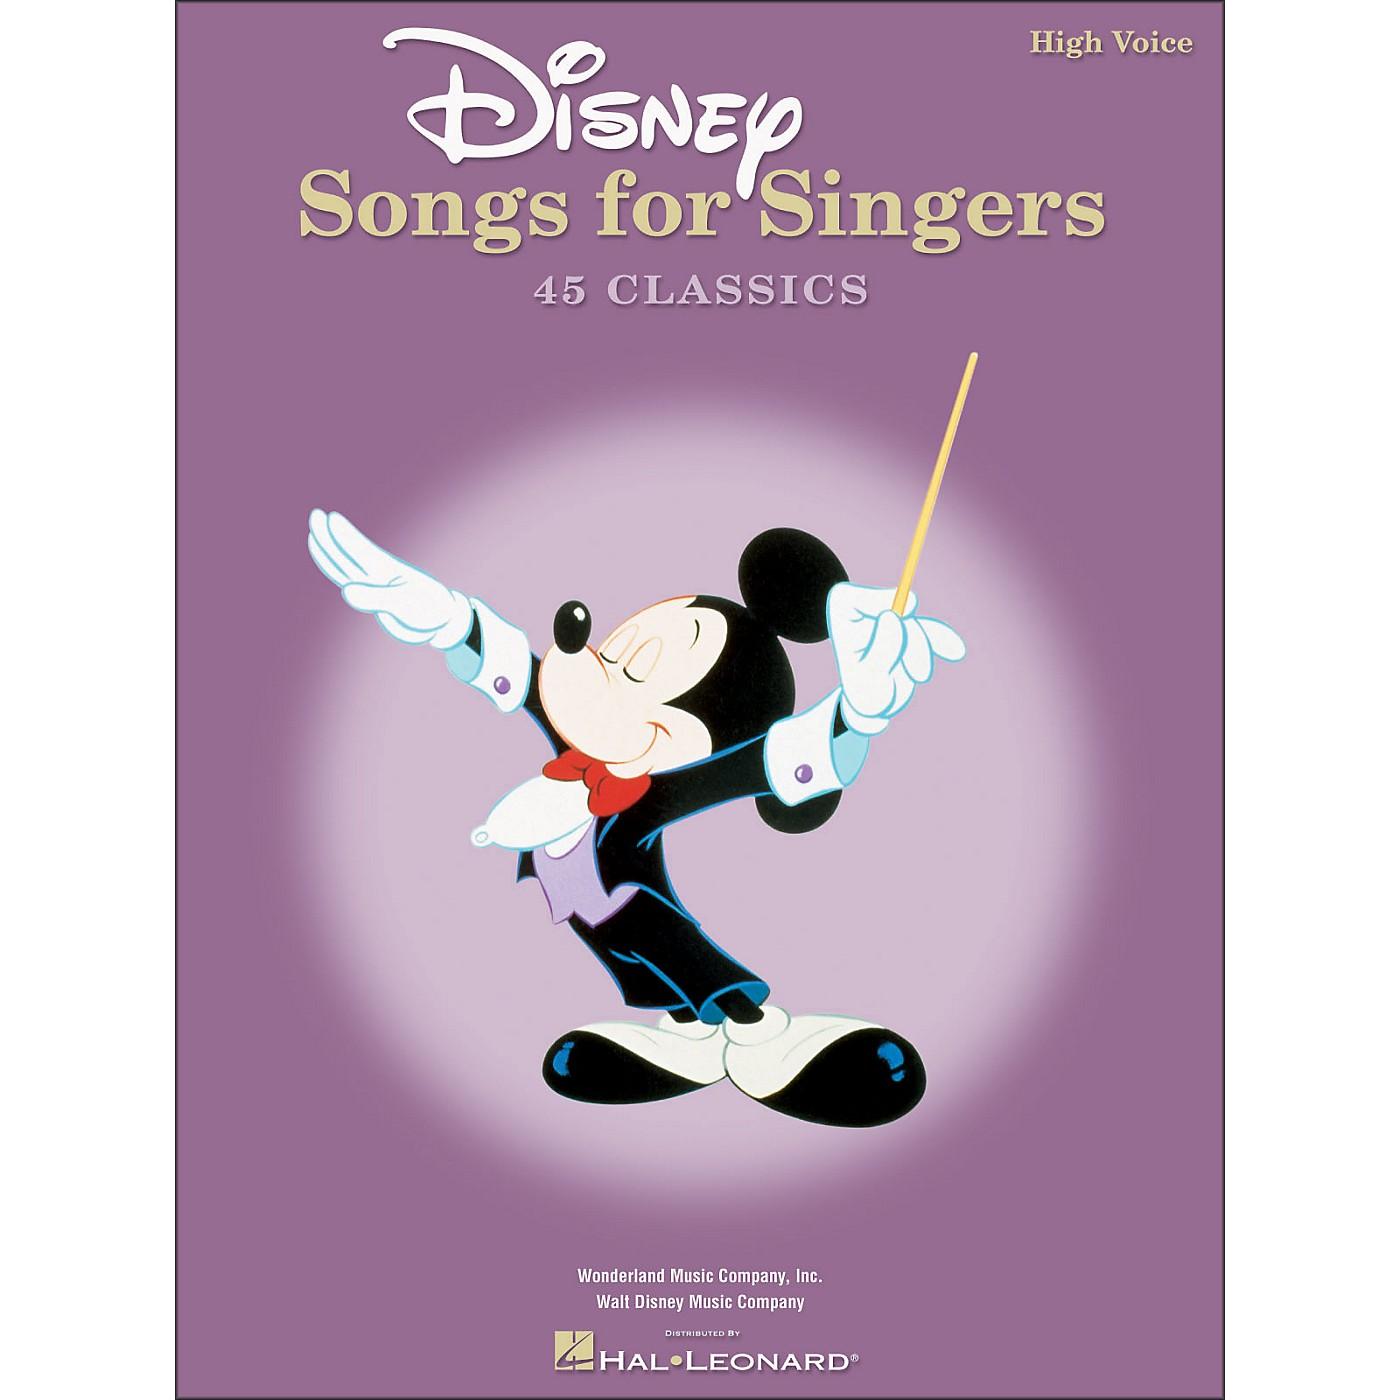 Hal Leonard Disney Songs for Singers for High Voice thumbnail